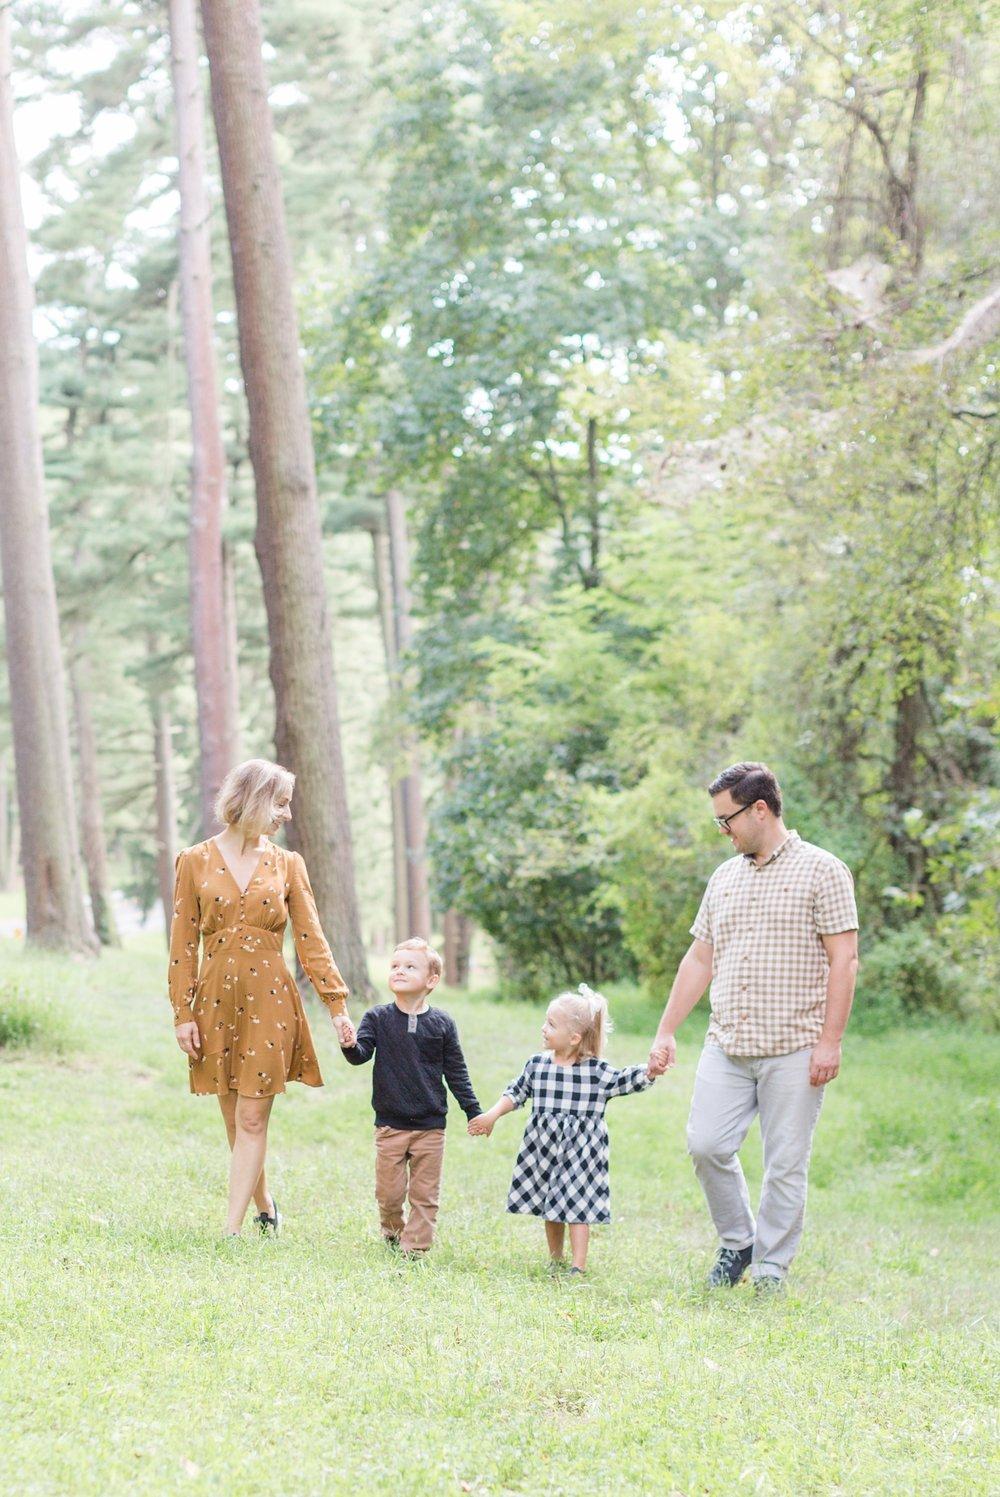 Robinson Siemen Family 2018-83_Loch-Raven-Reservoir-Maryland-Family-Photographer-anna-grace-photography-photo.jpg